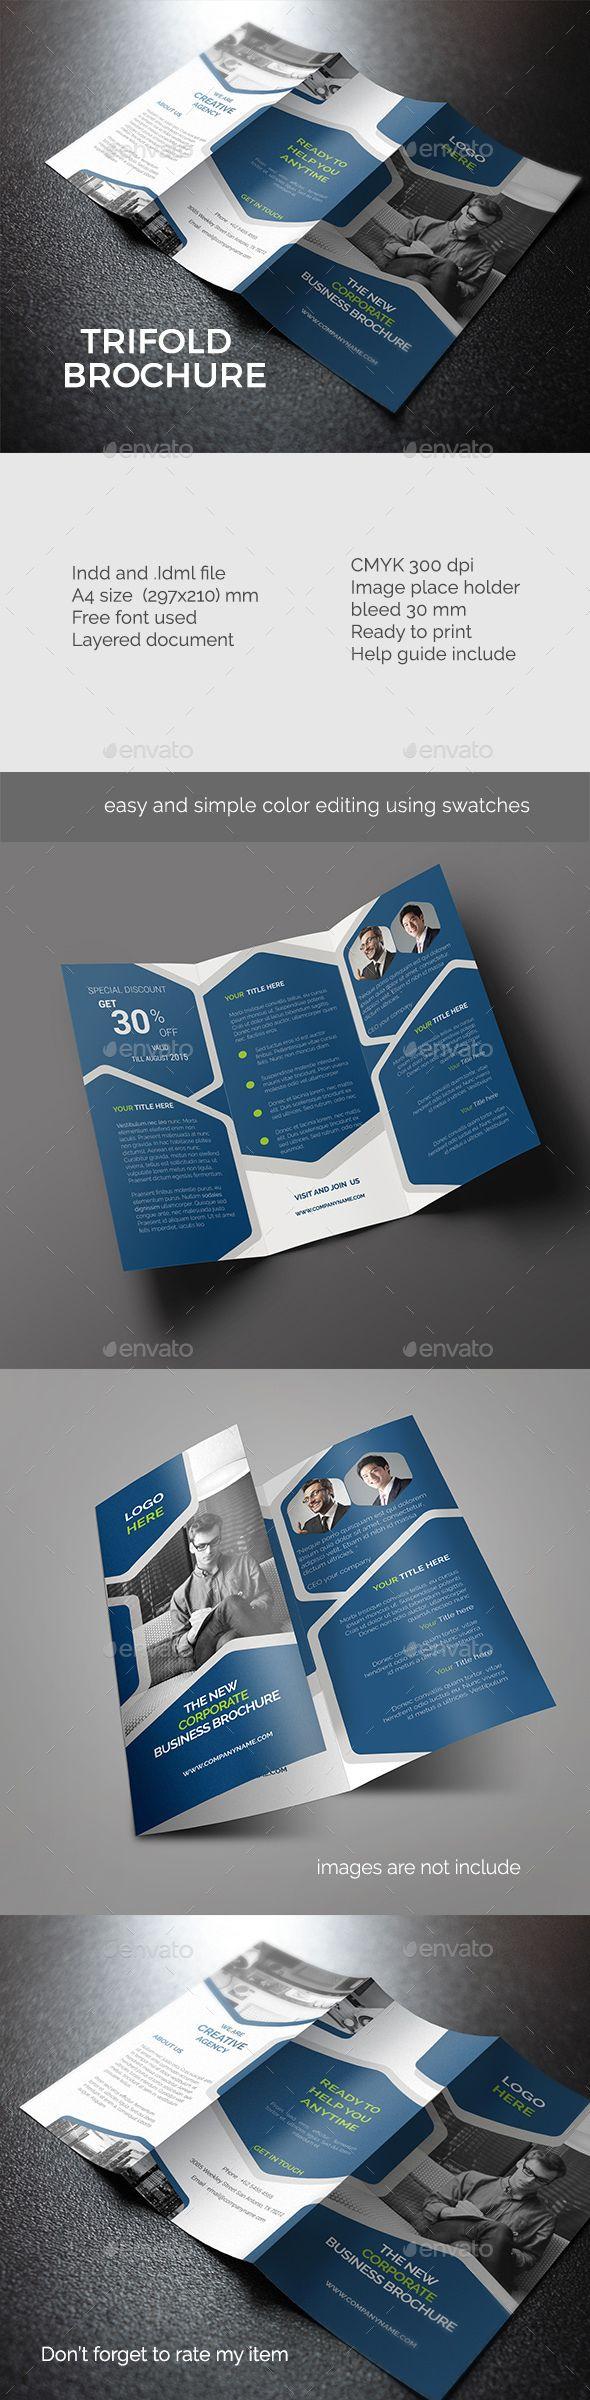 32 best tri fold brochures images on pinterest brochure for Trifold brochure indesign template